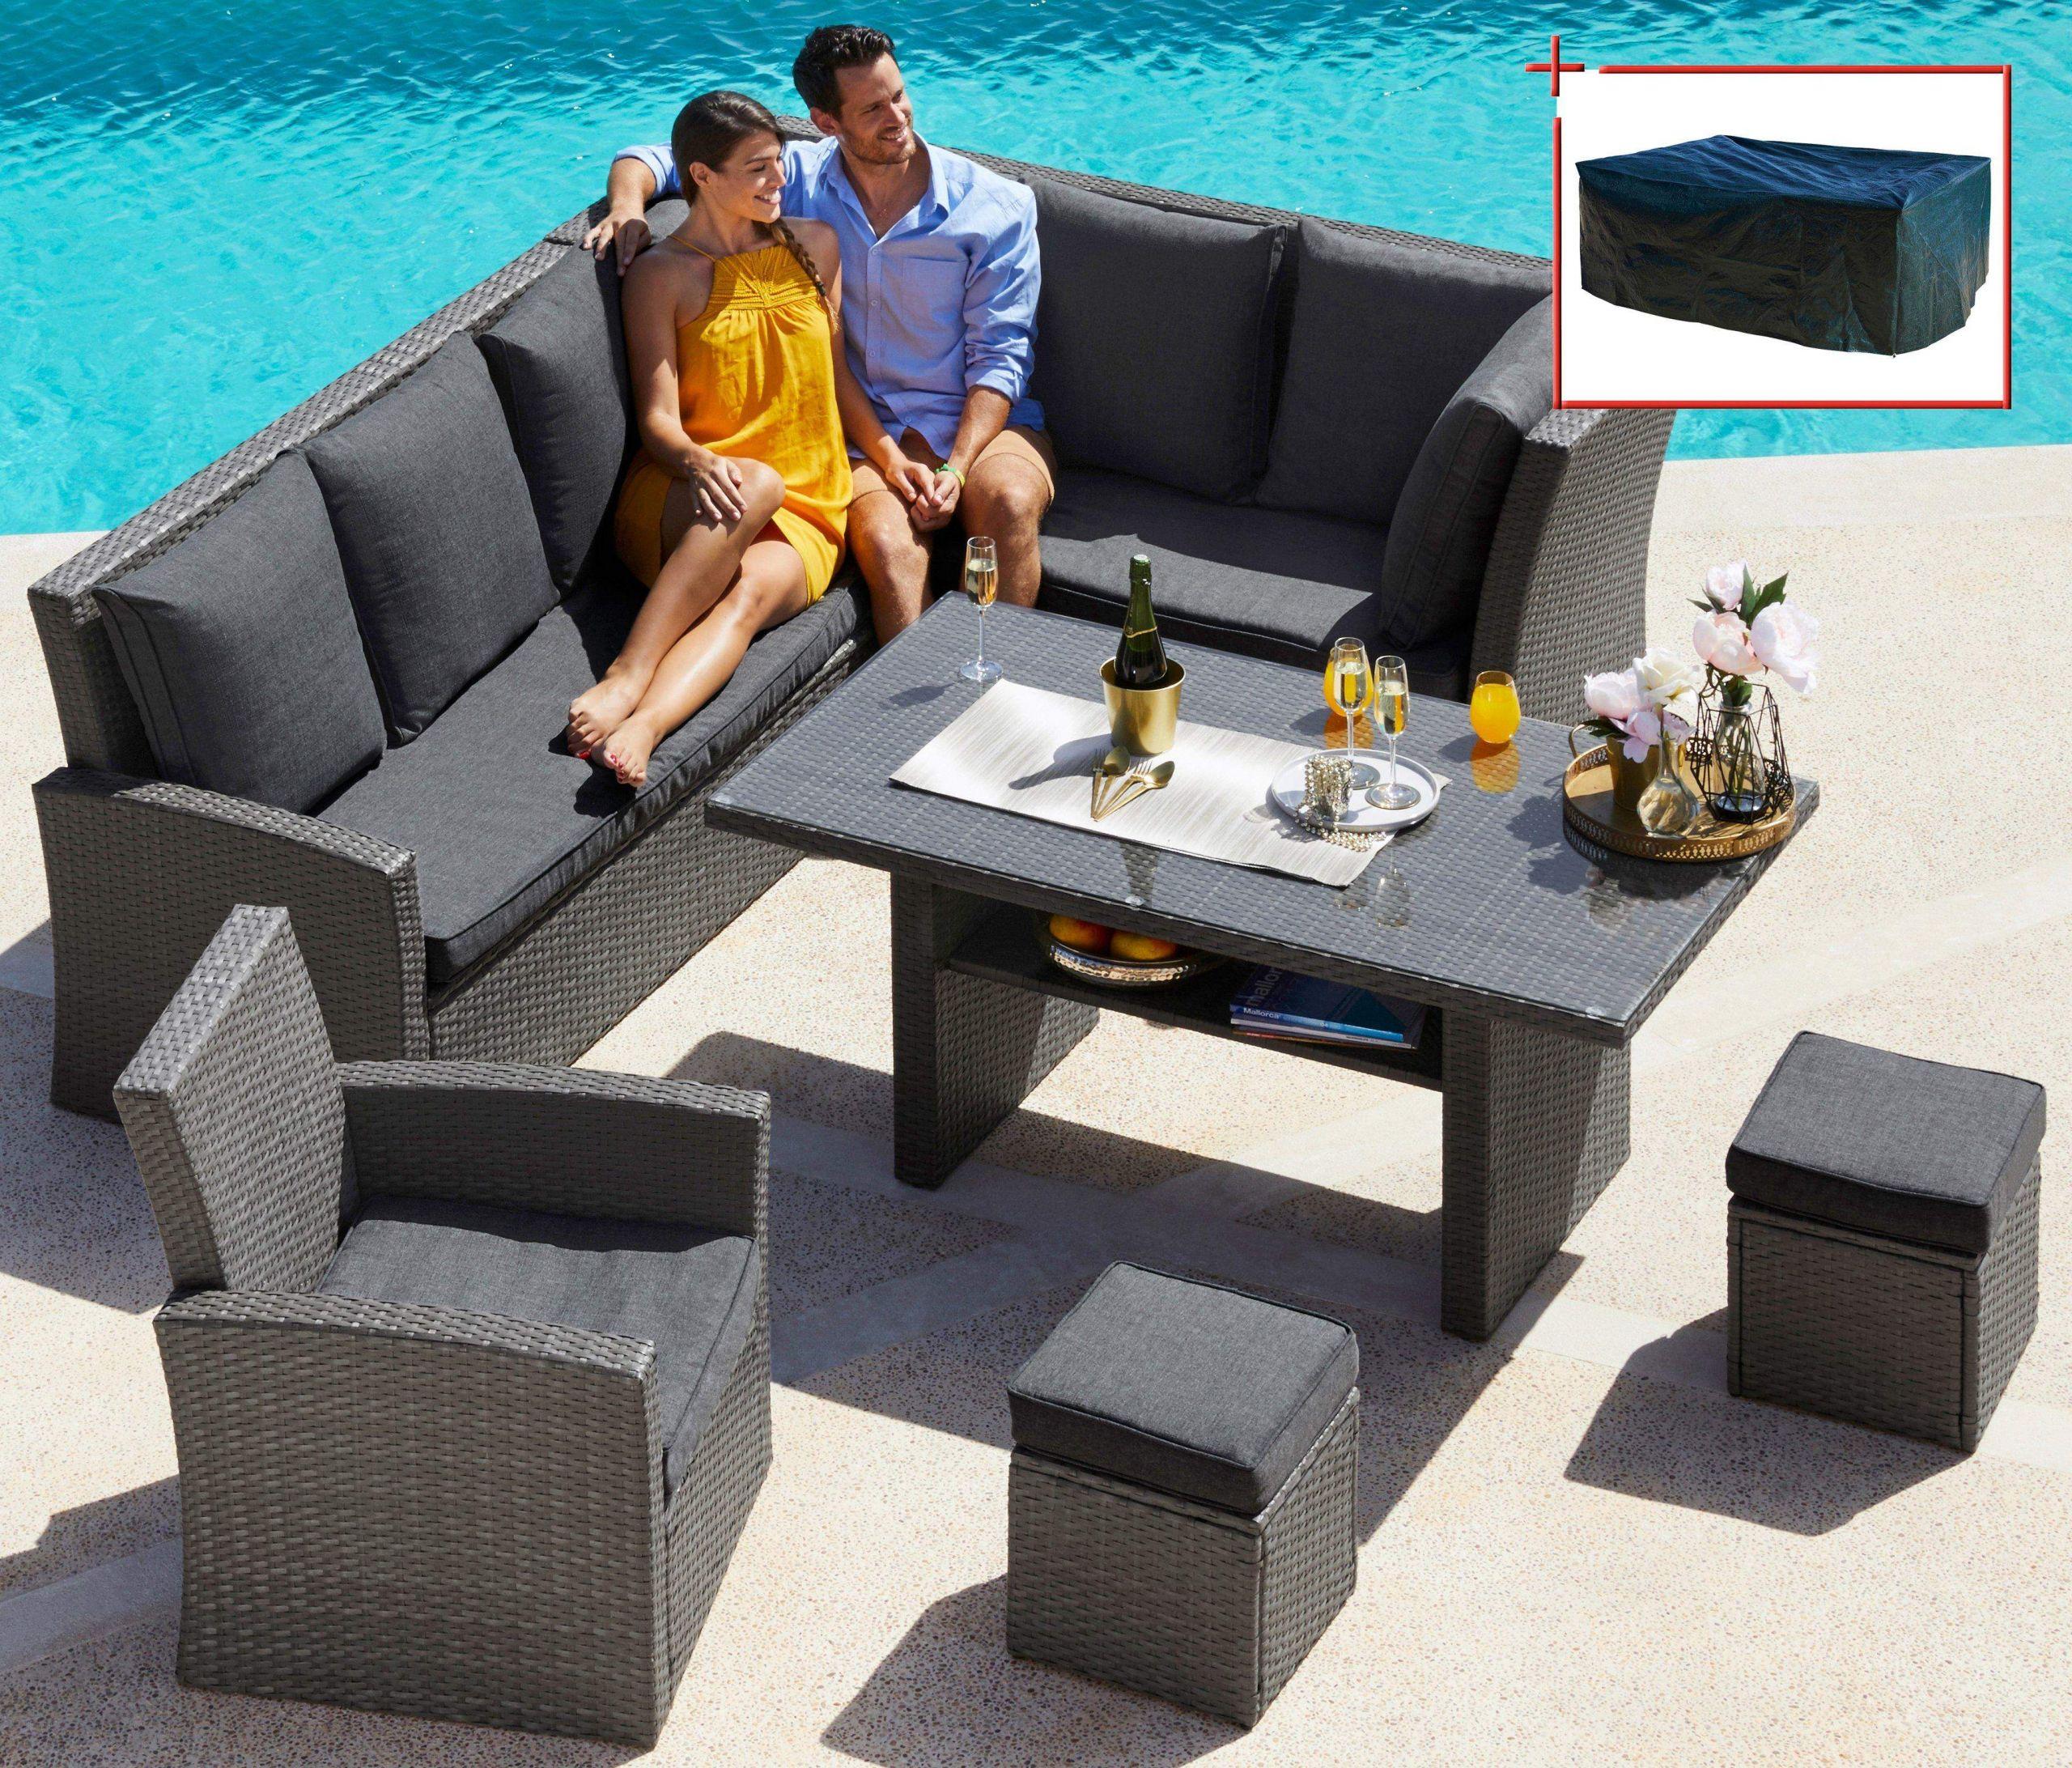 loungeset santorini premium 20 tlg eckbank sessel 2 hocker tisch polyrattan